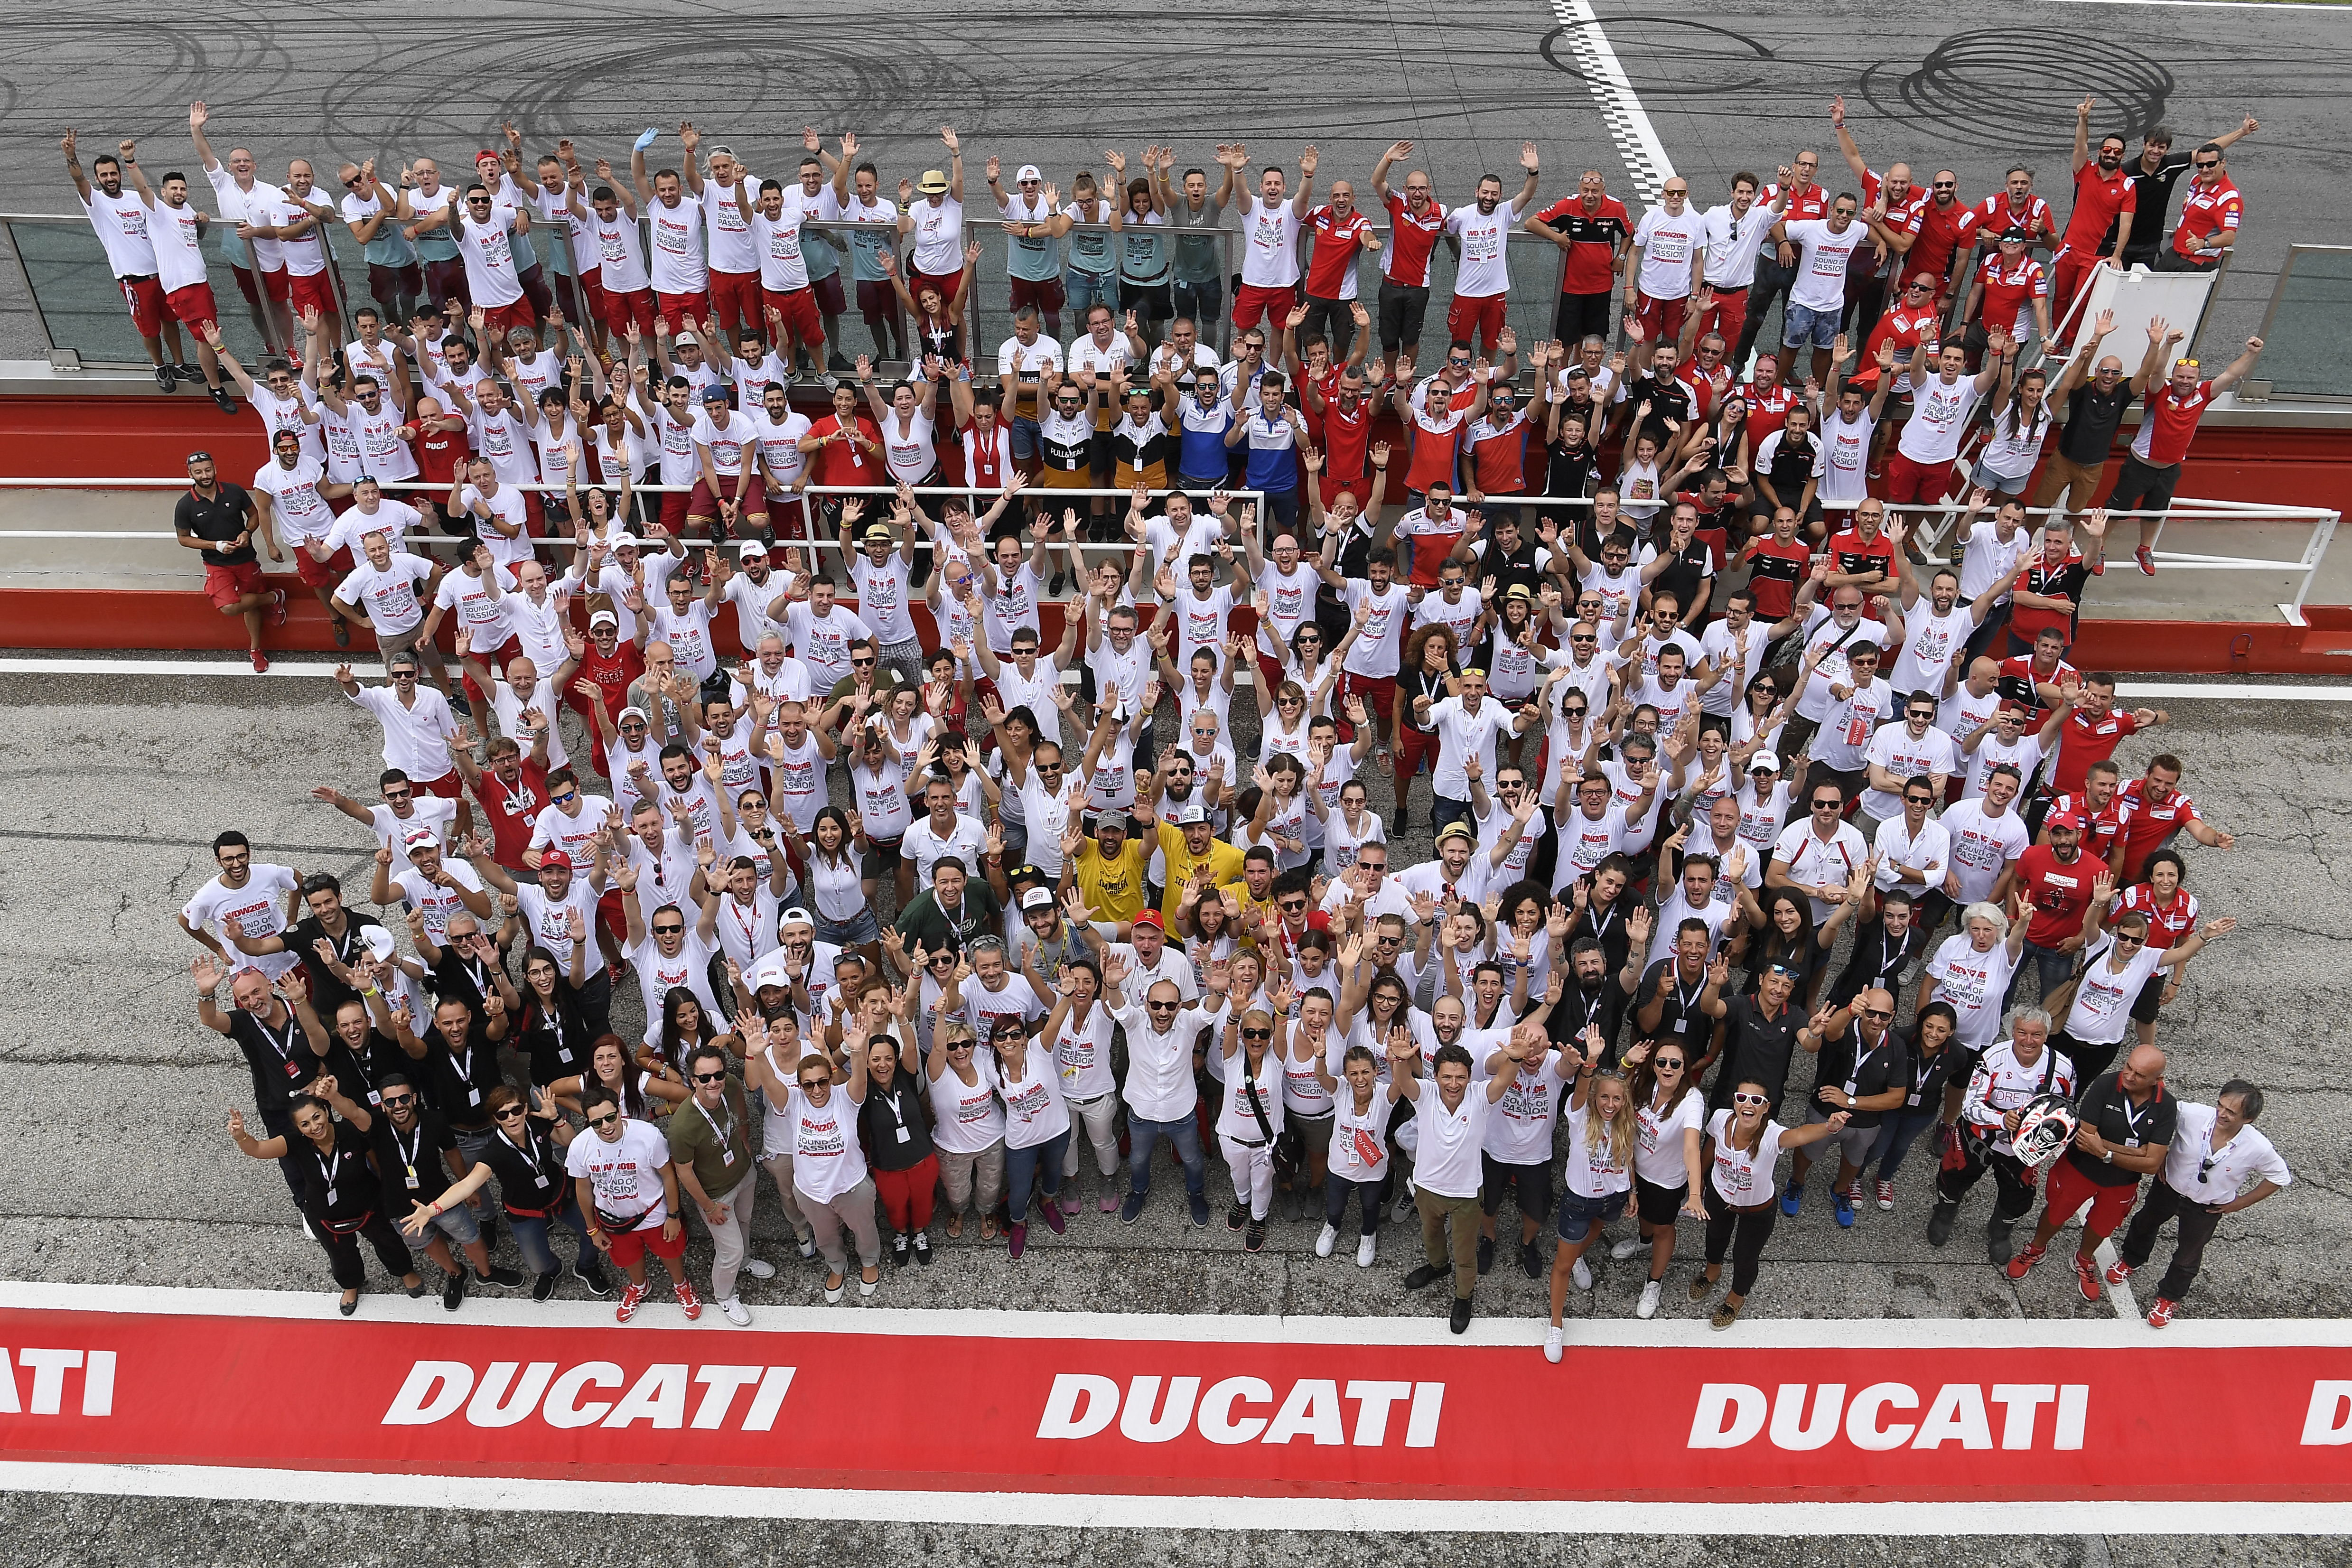 World Ducati Week 2018 Ducati Staff group